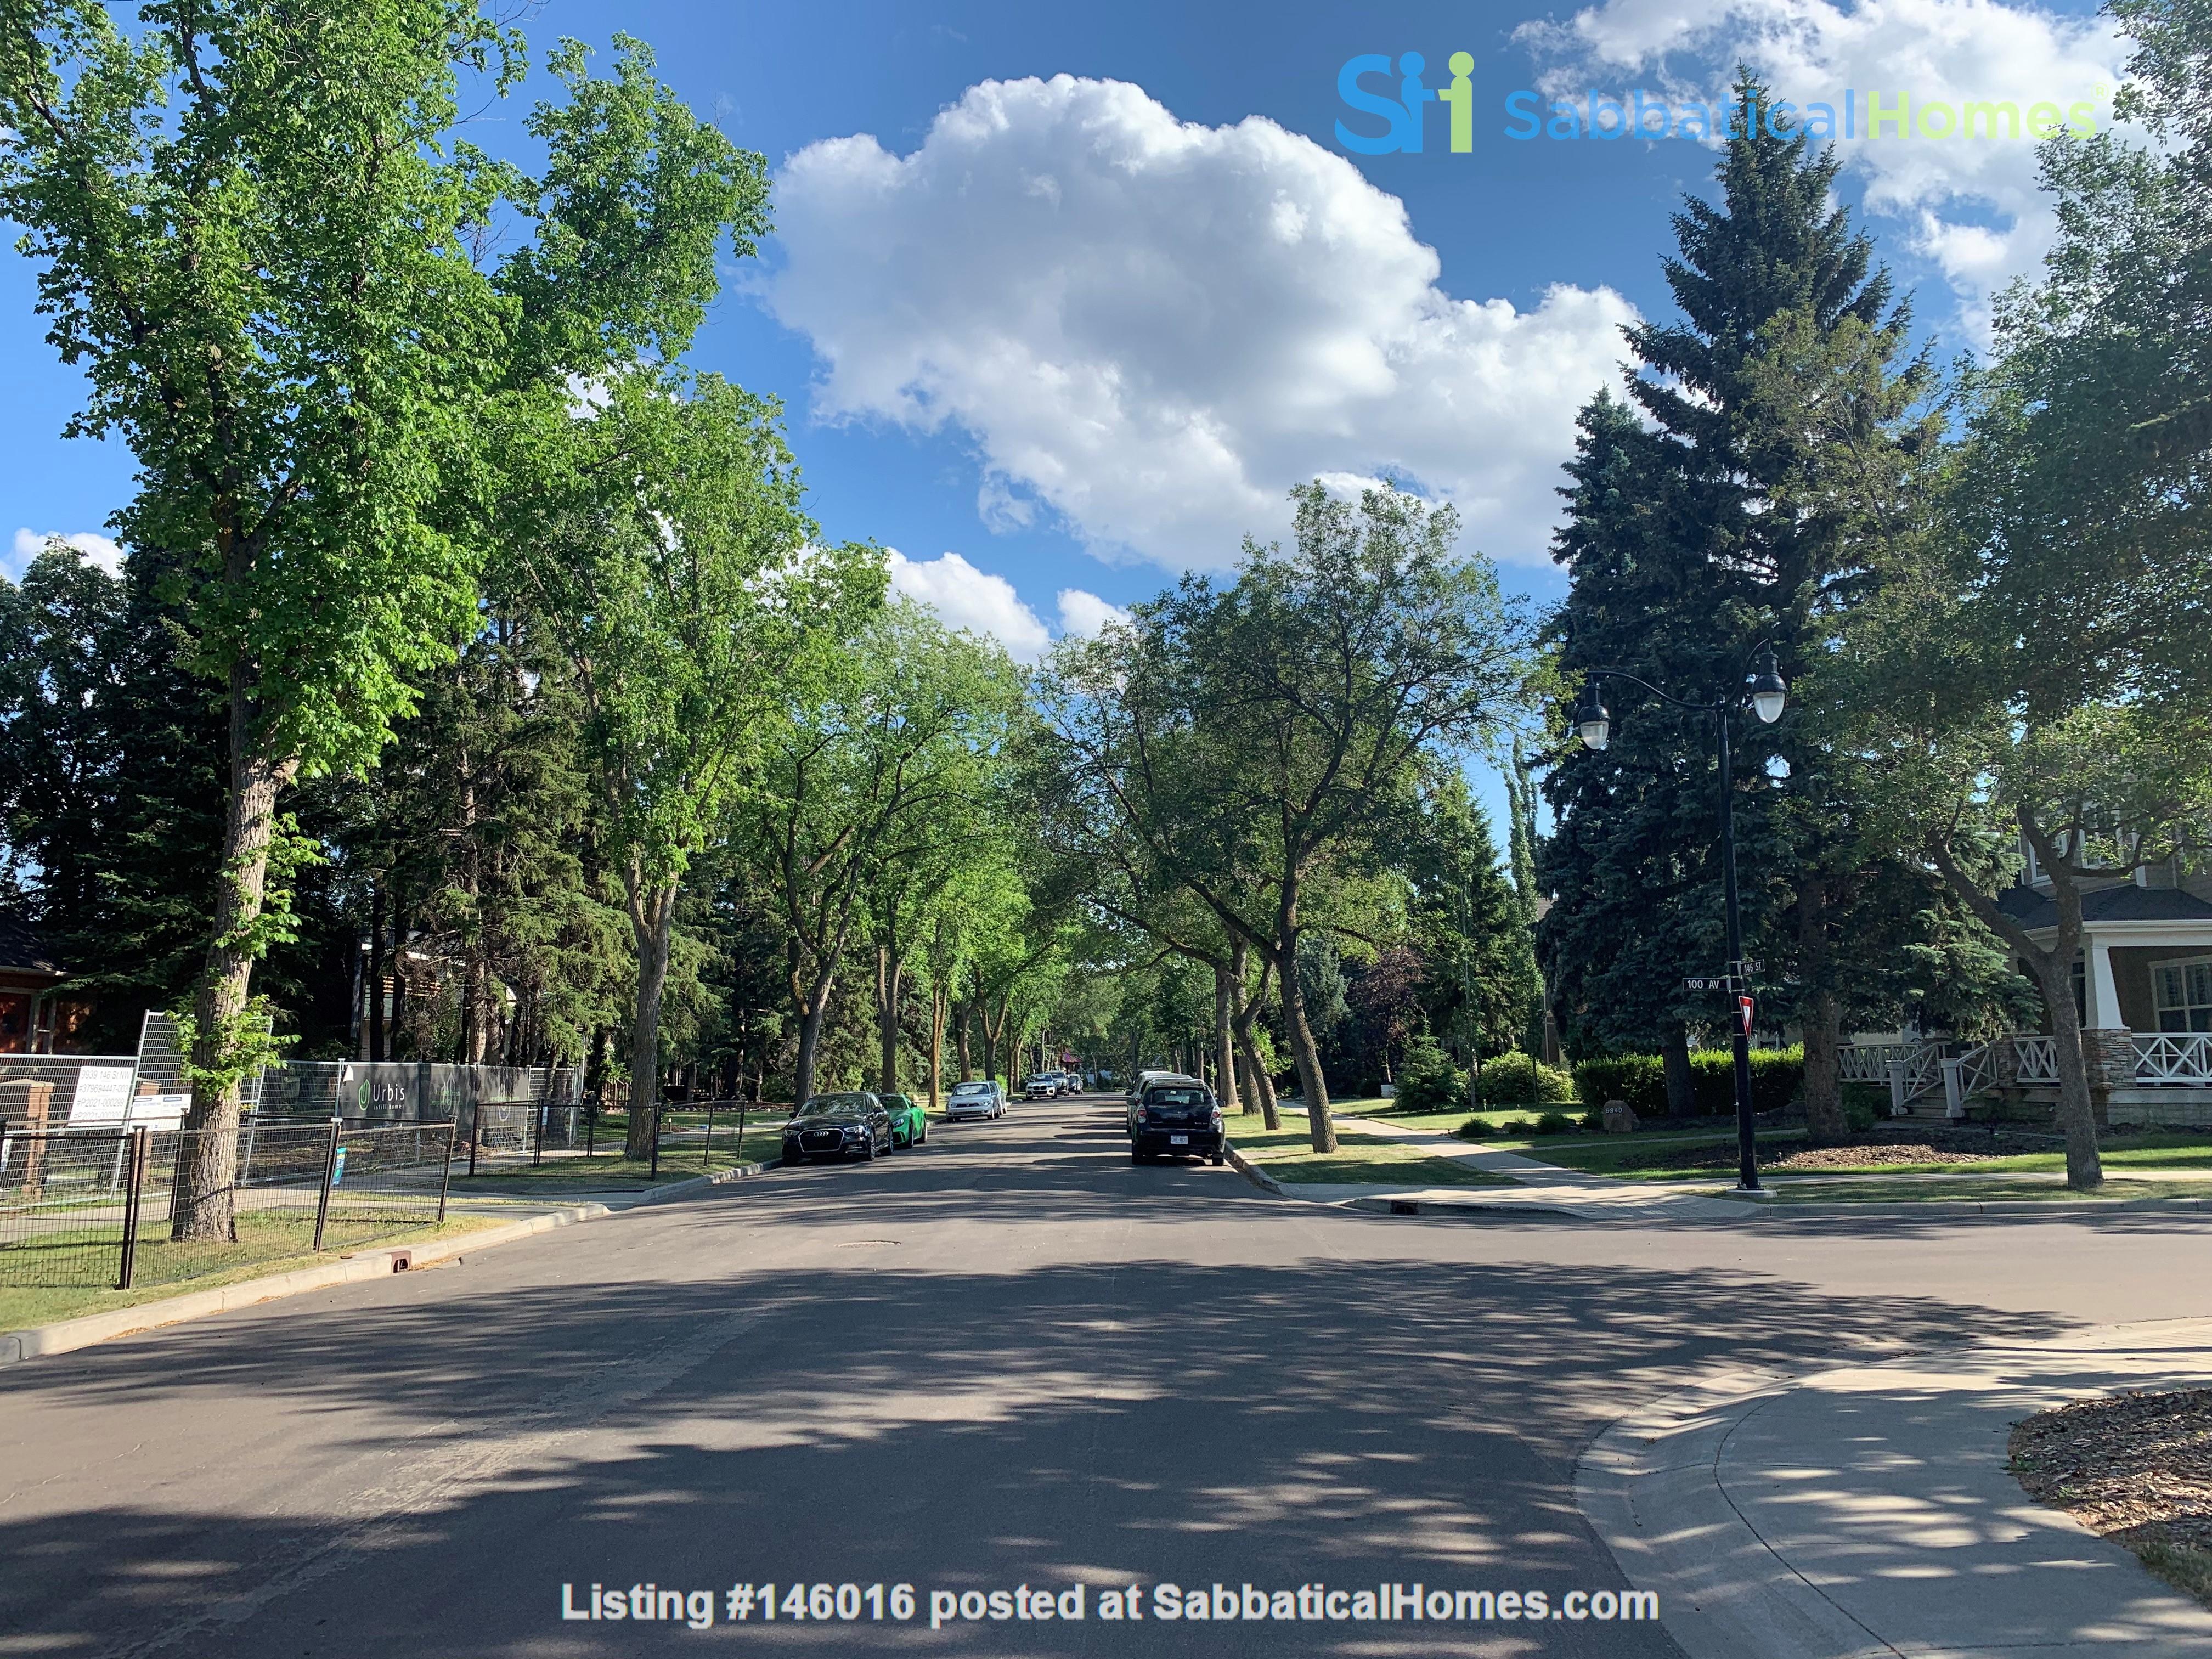 Forest haven sabbatical home Home Rental in Edmonton 5